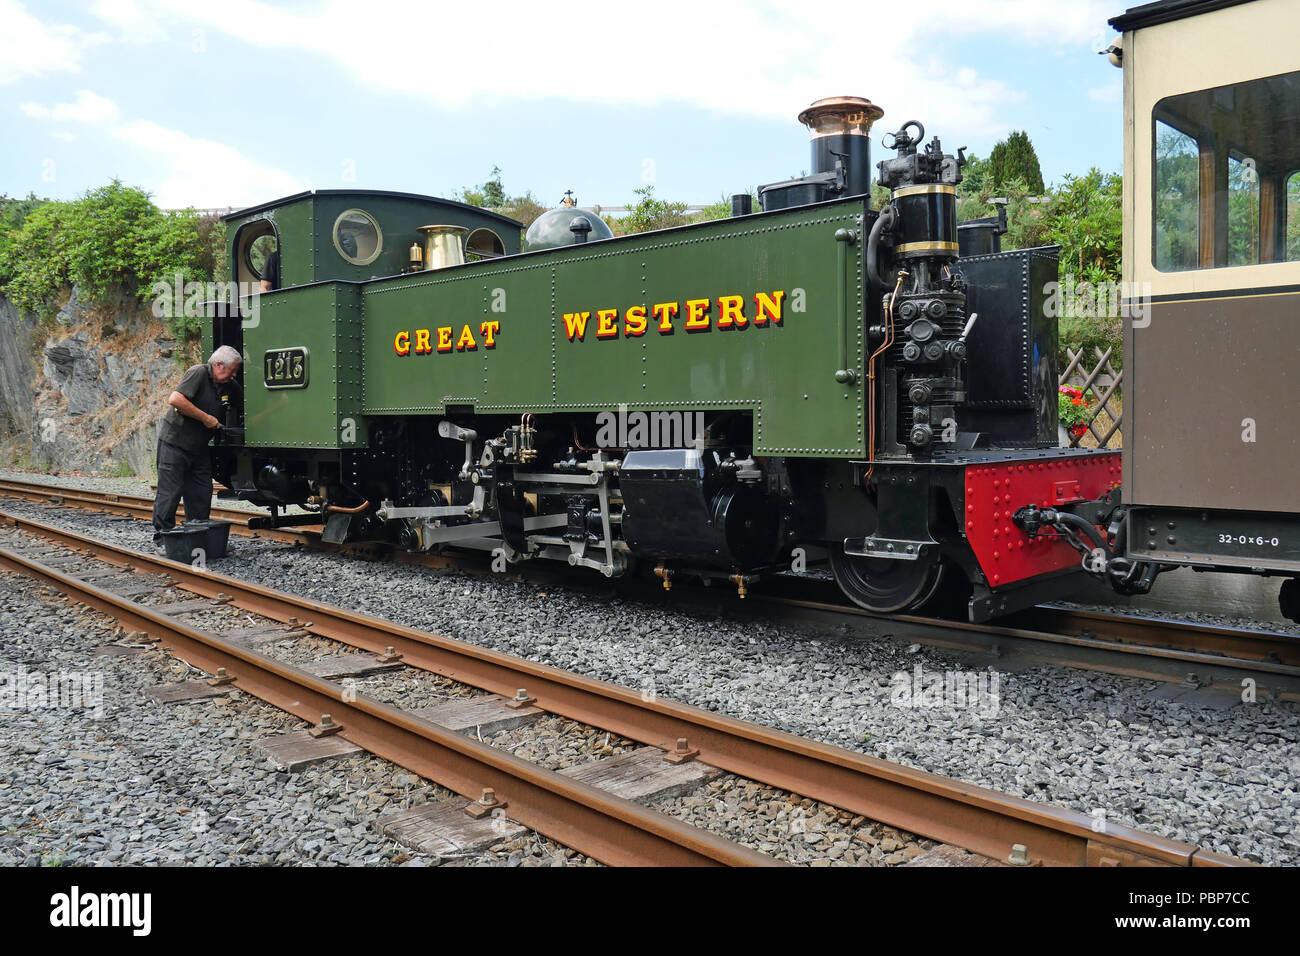 Devil's Bridge, Wales, UK. July 26th 2018 - Steam Train (Prairie Class Rhino Tank) at the railway Station. - Stock Image